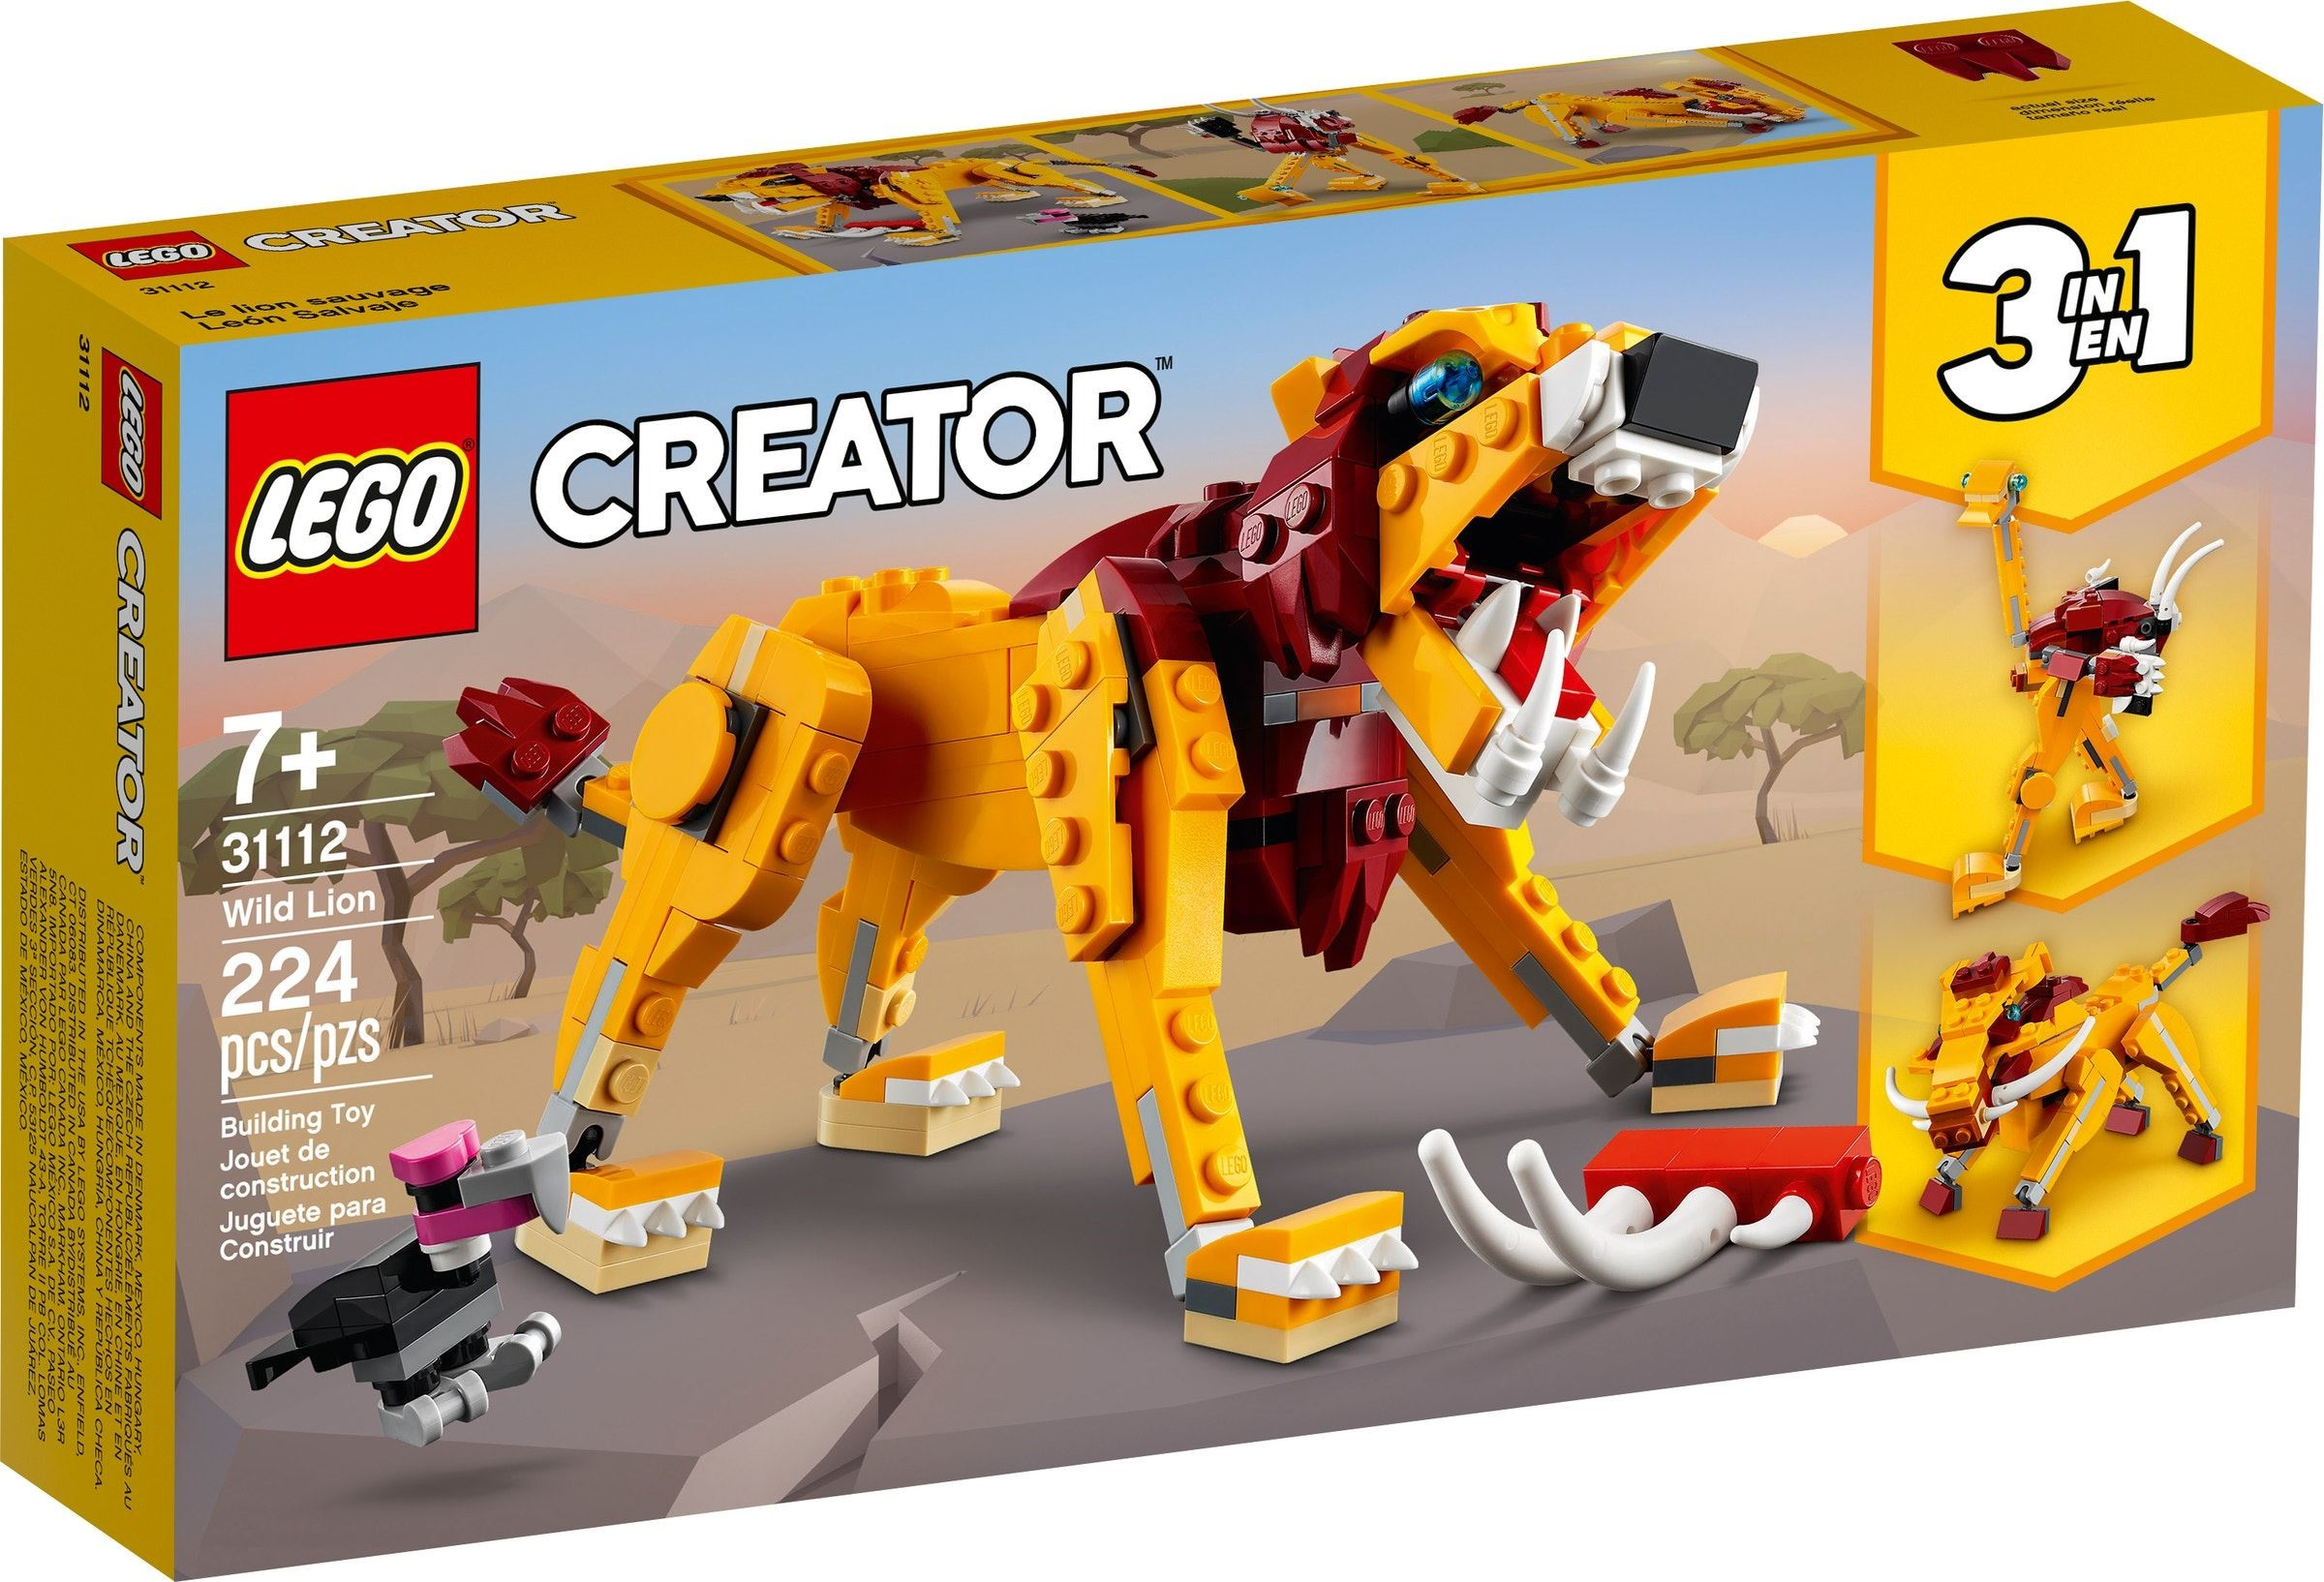 LEGO Creator - Wild Lion (31112)